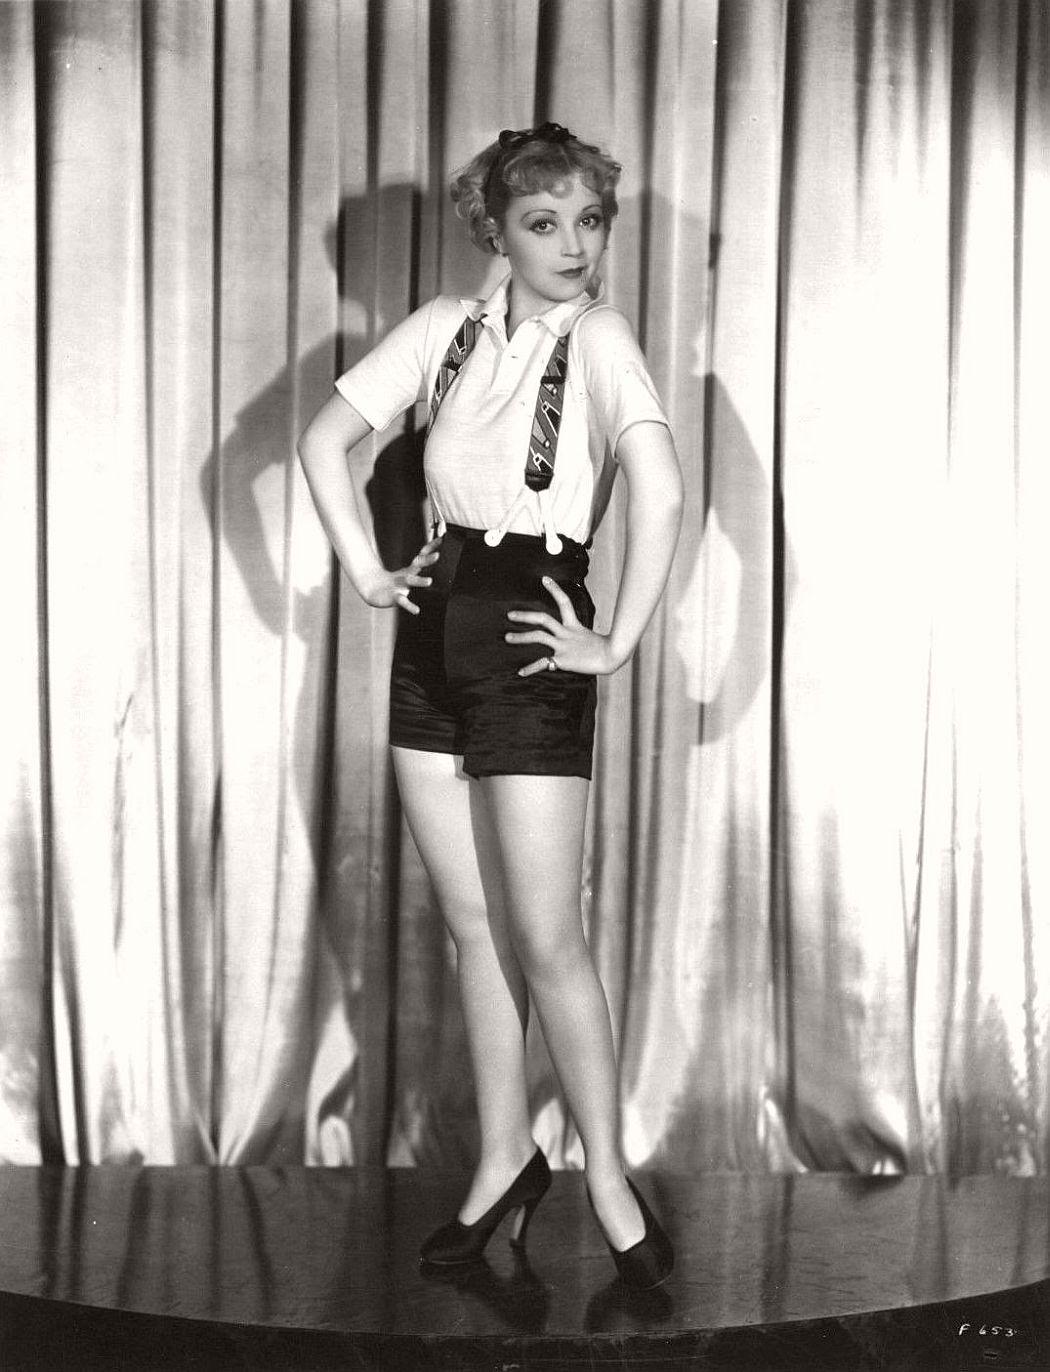 vintage-black-white-portrait-hollywood-movie-actress-1930s-Alice-White